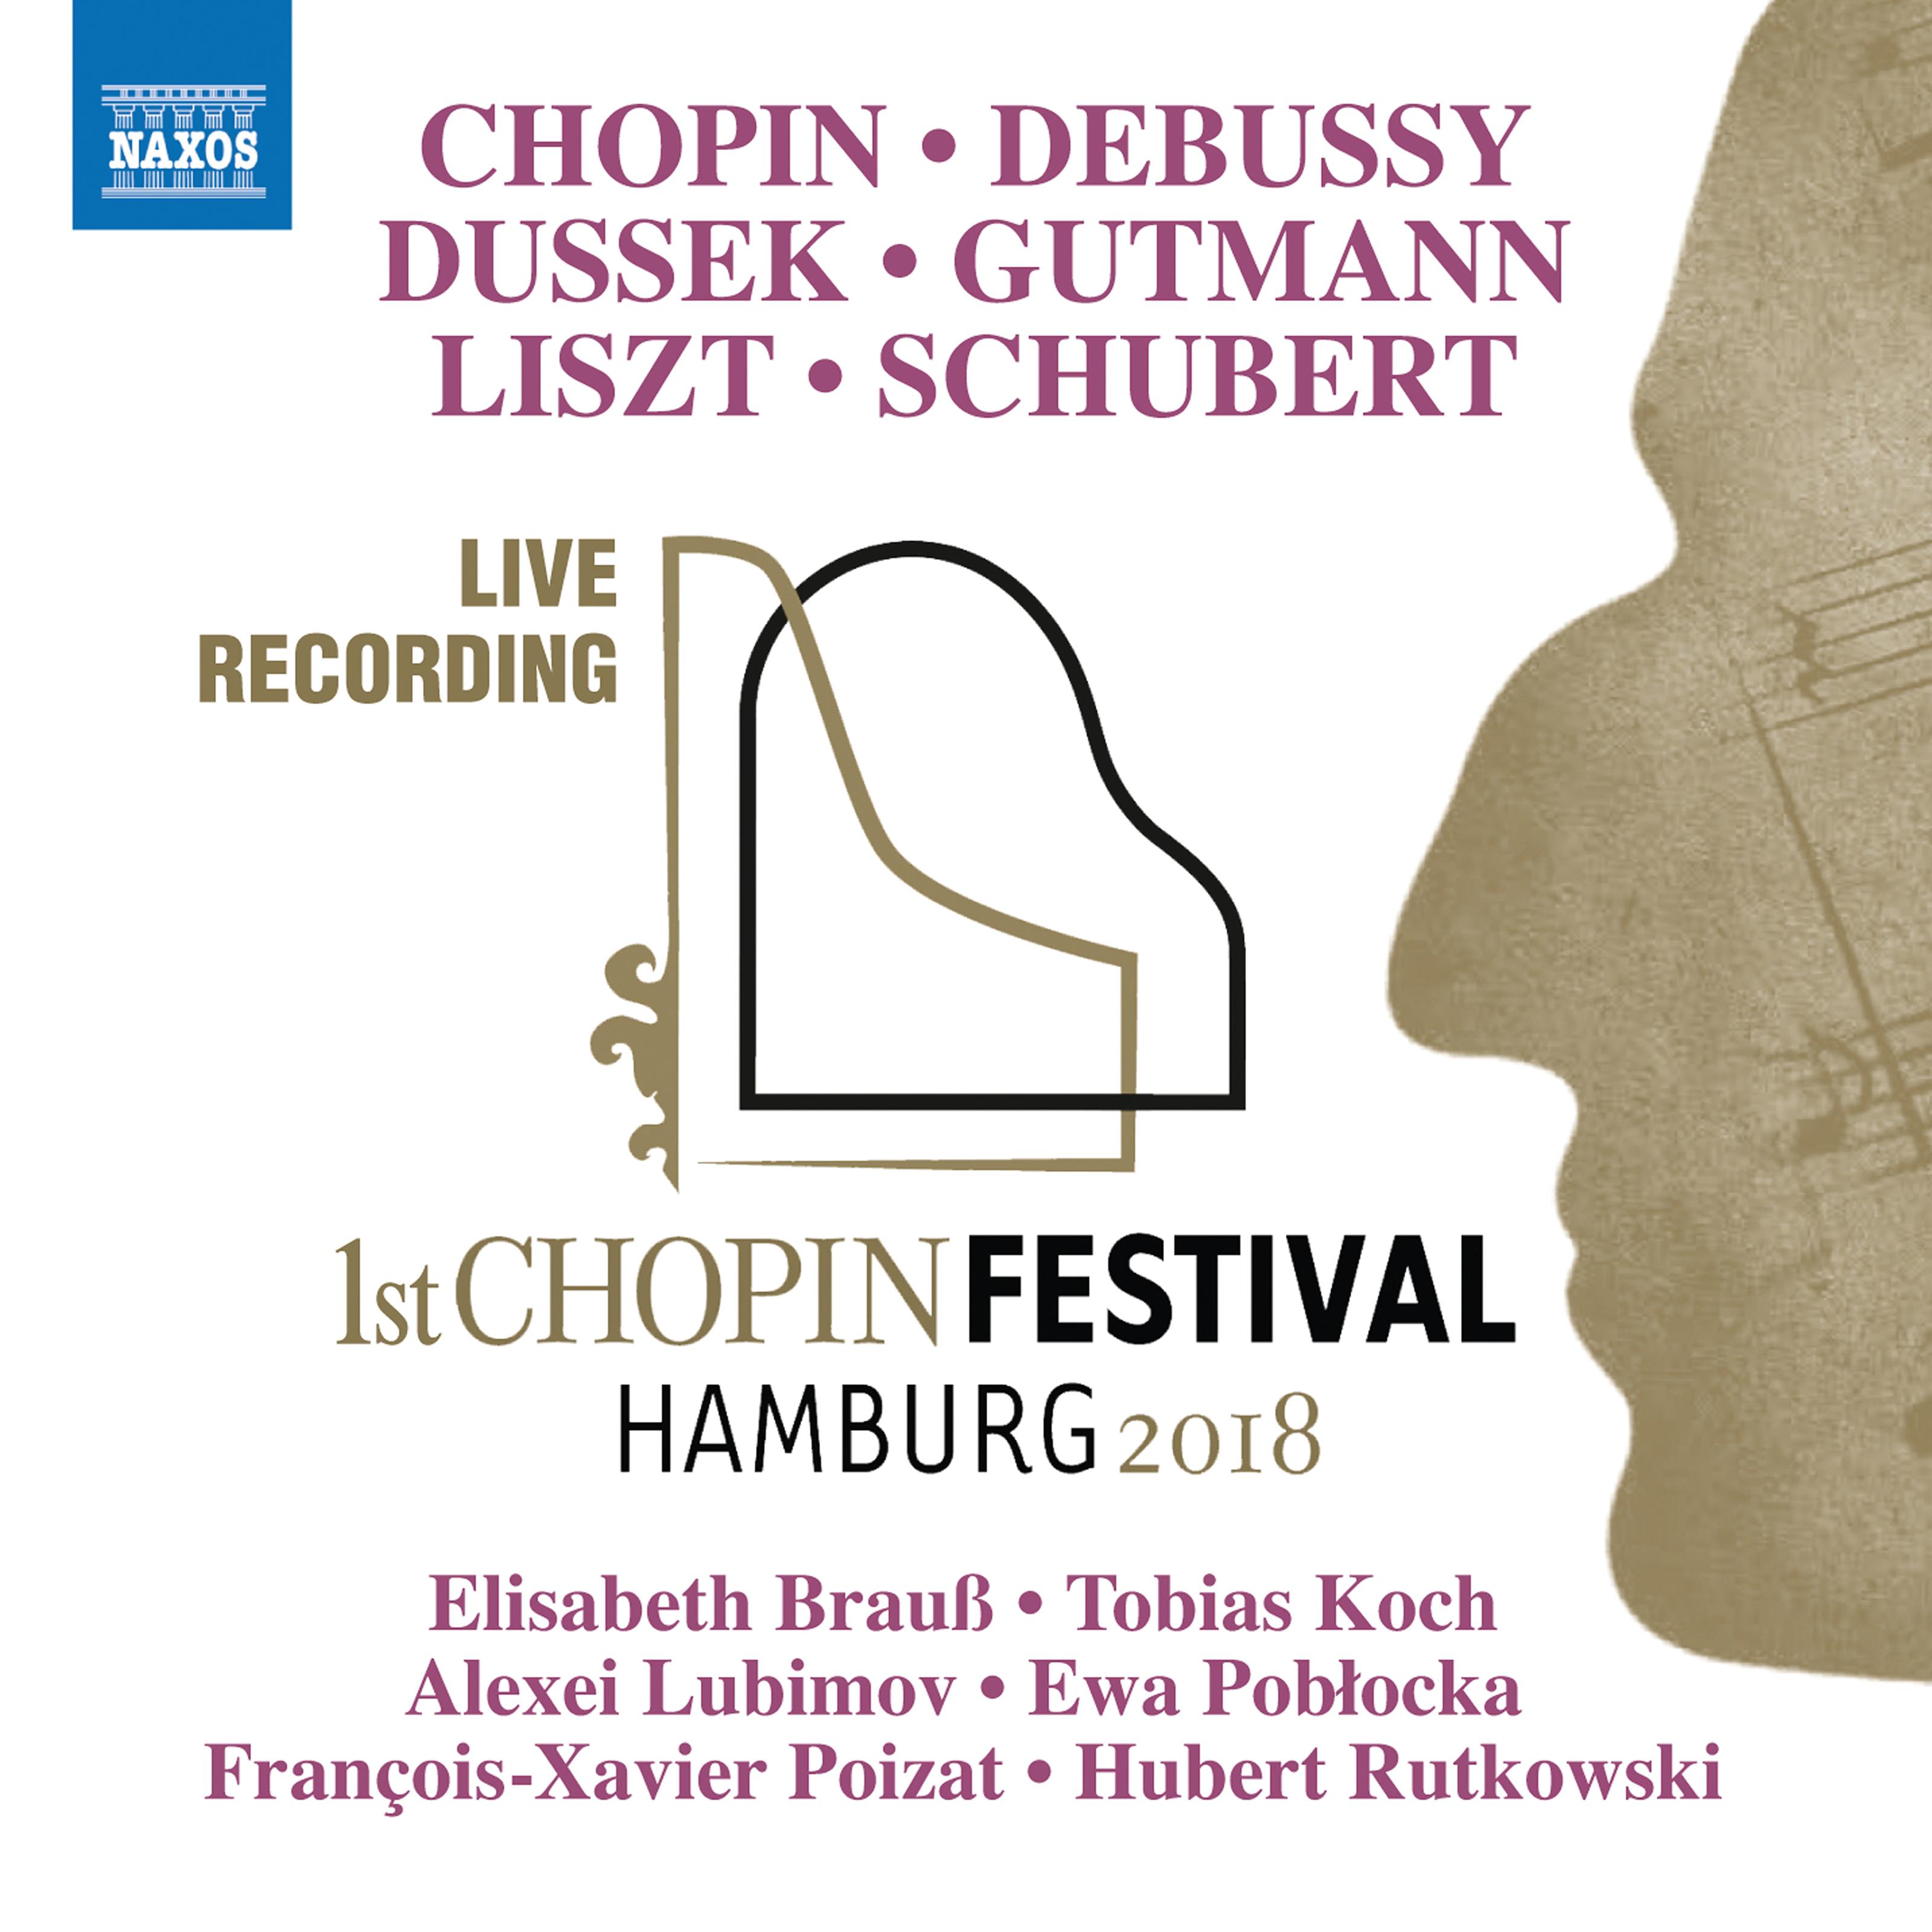 1st Chopin Festival Hamburg 2018 (Live)